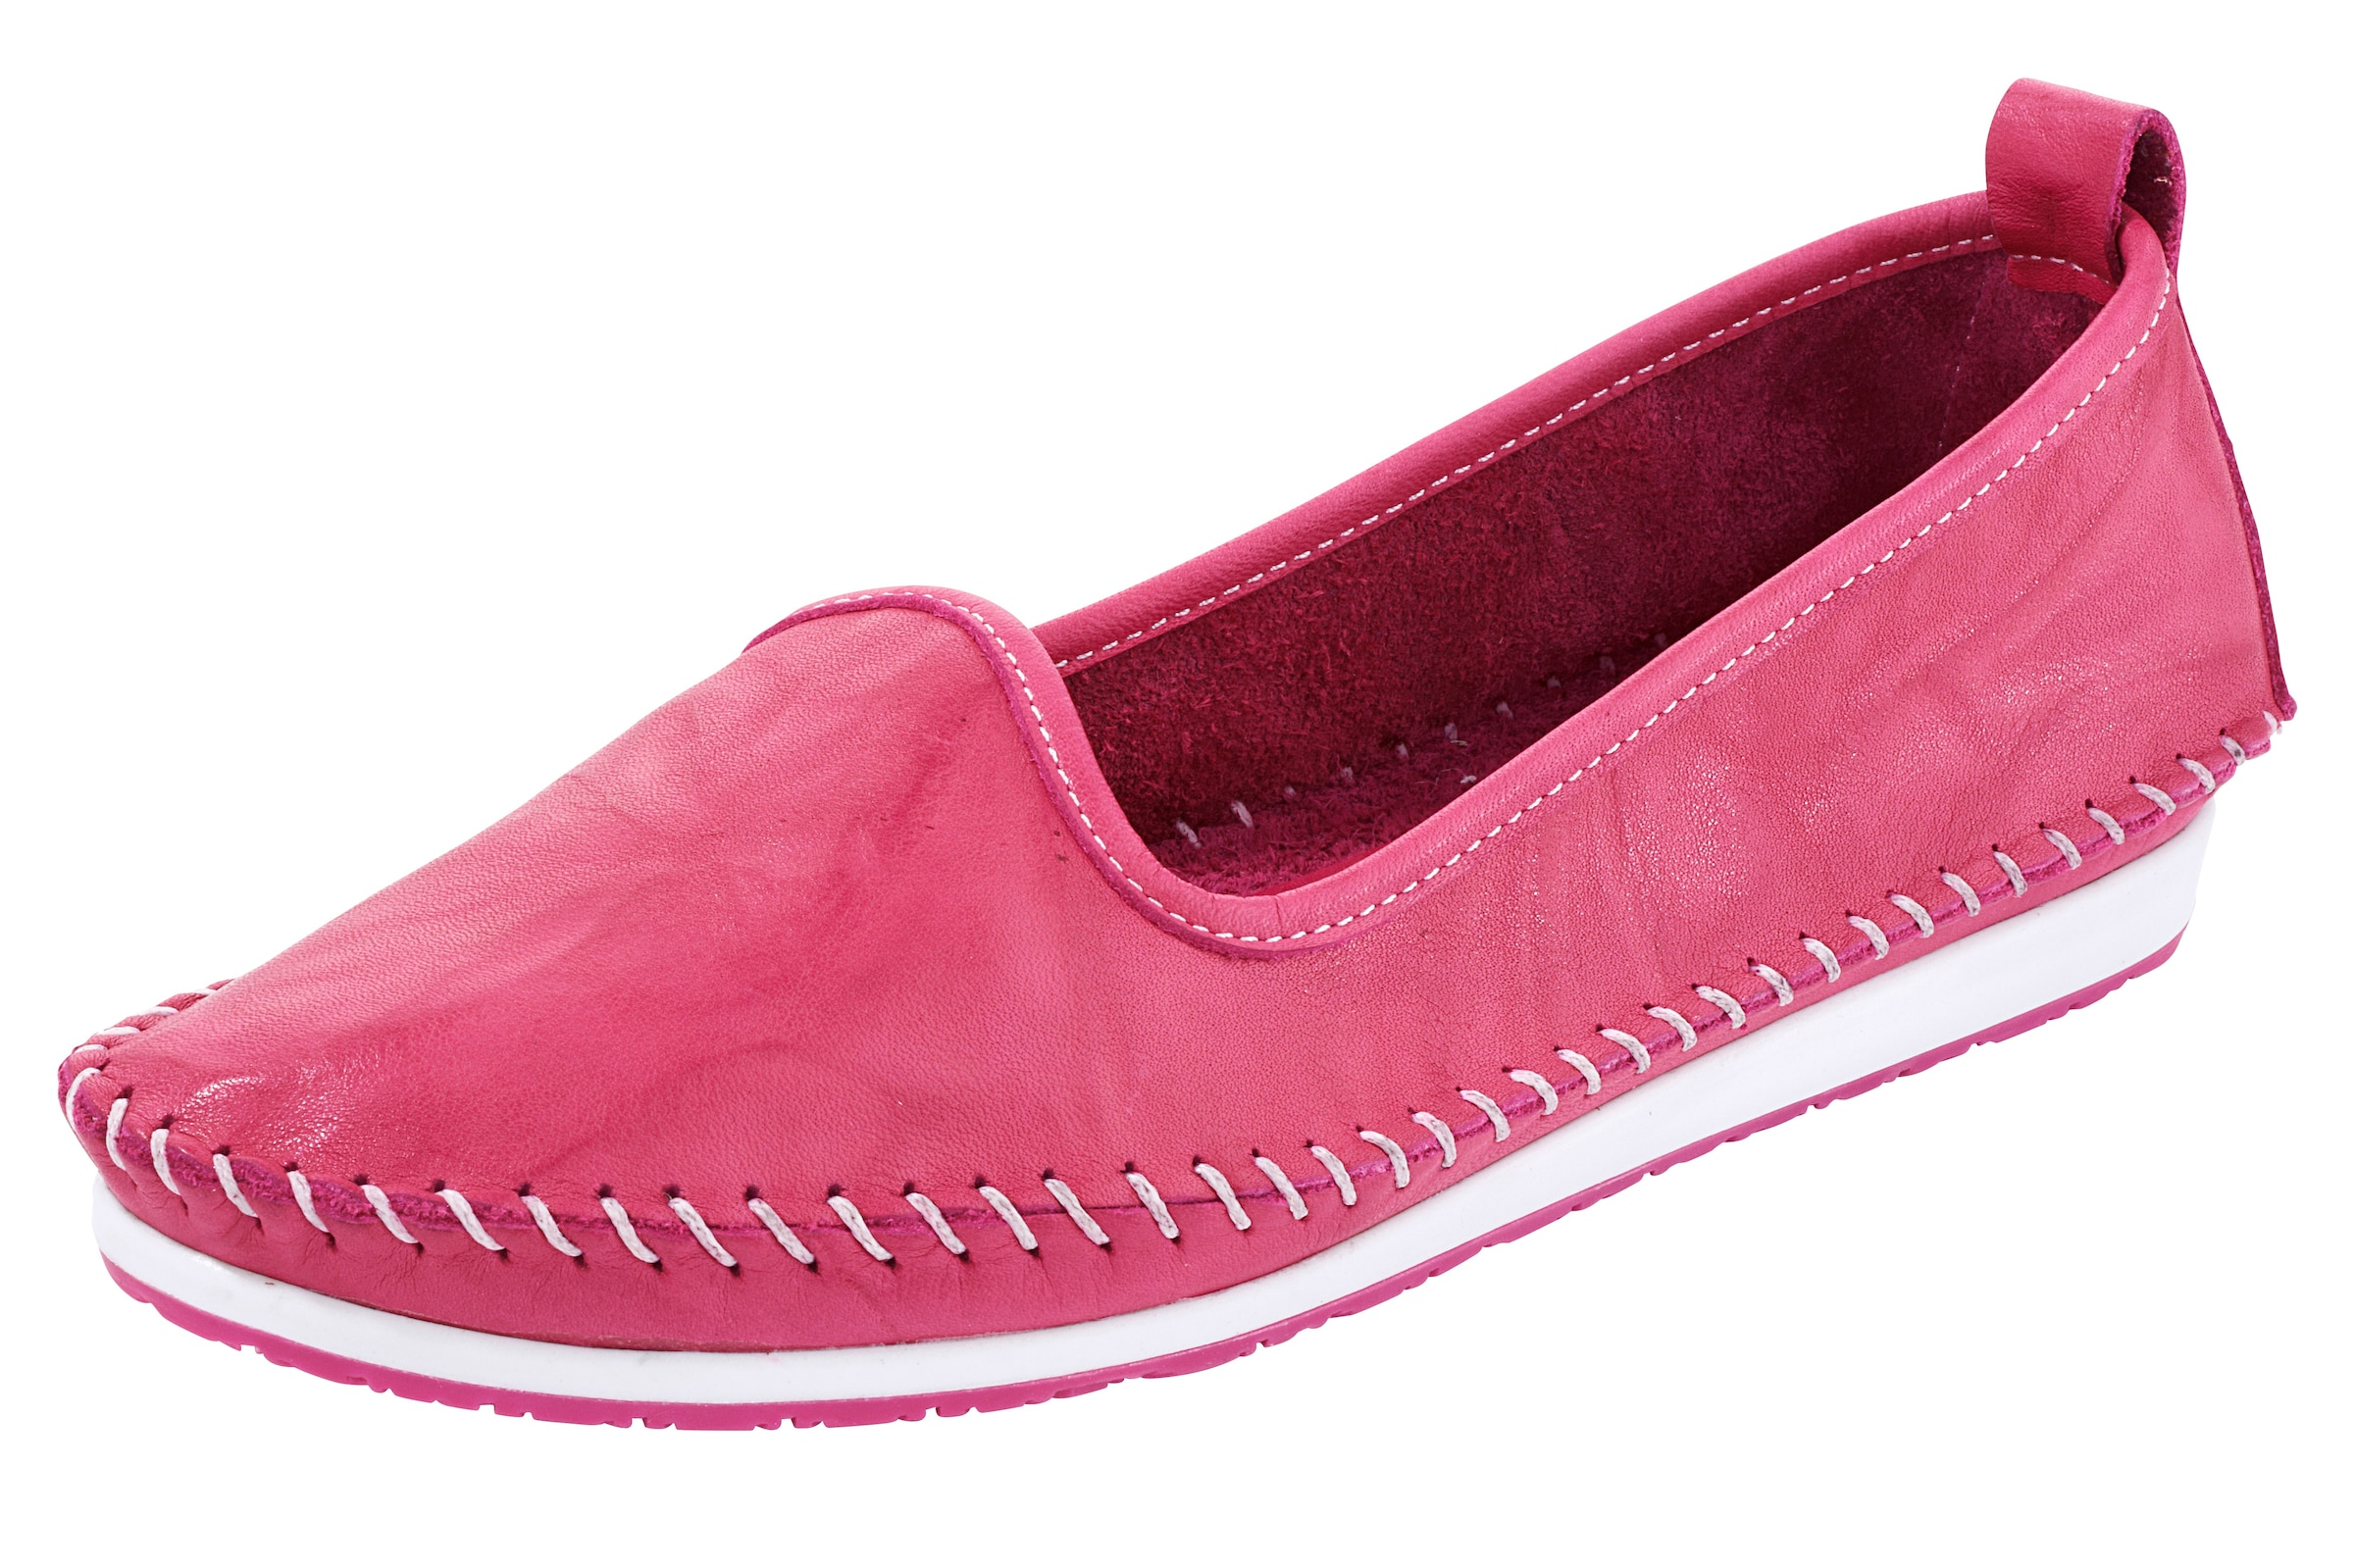 ANDREA CONTI Komfort-Slipper Verschleißfeste billige Schuhe